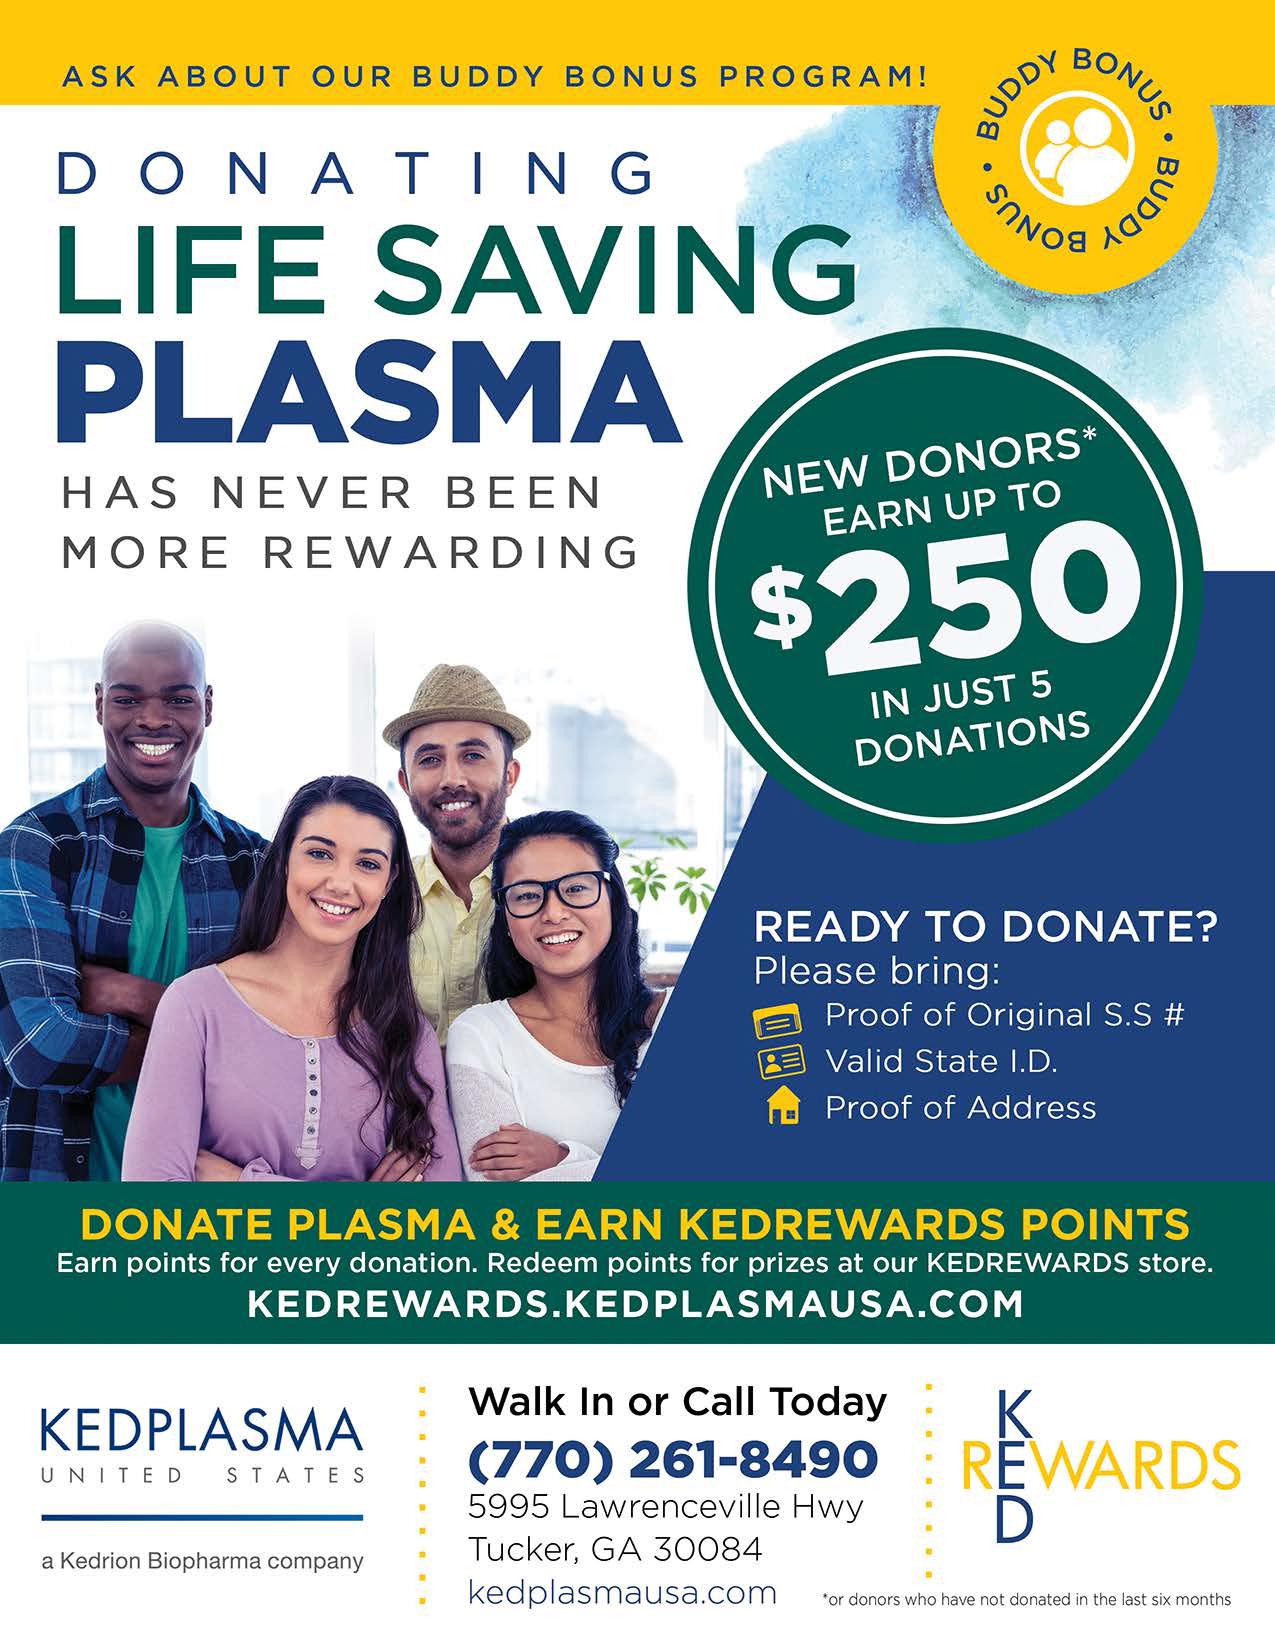 Kedplasma: Donate Today!